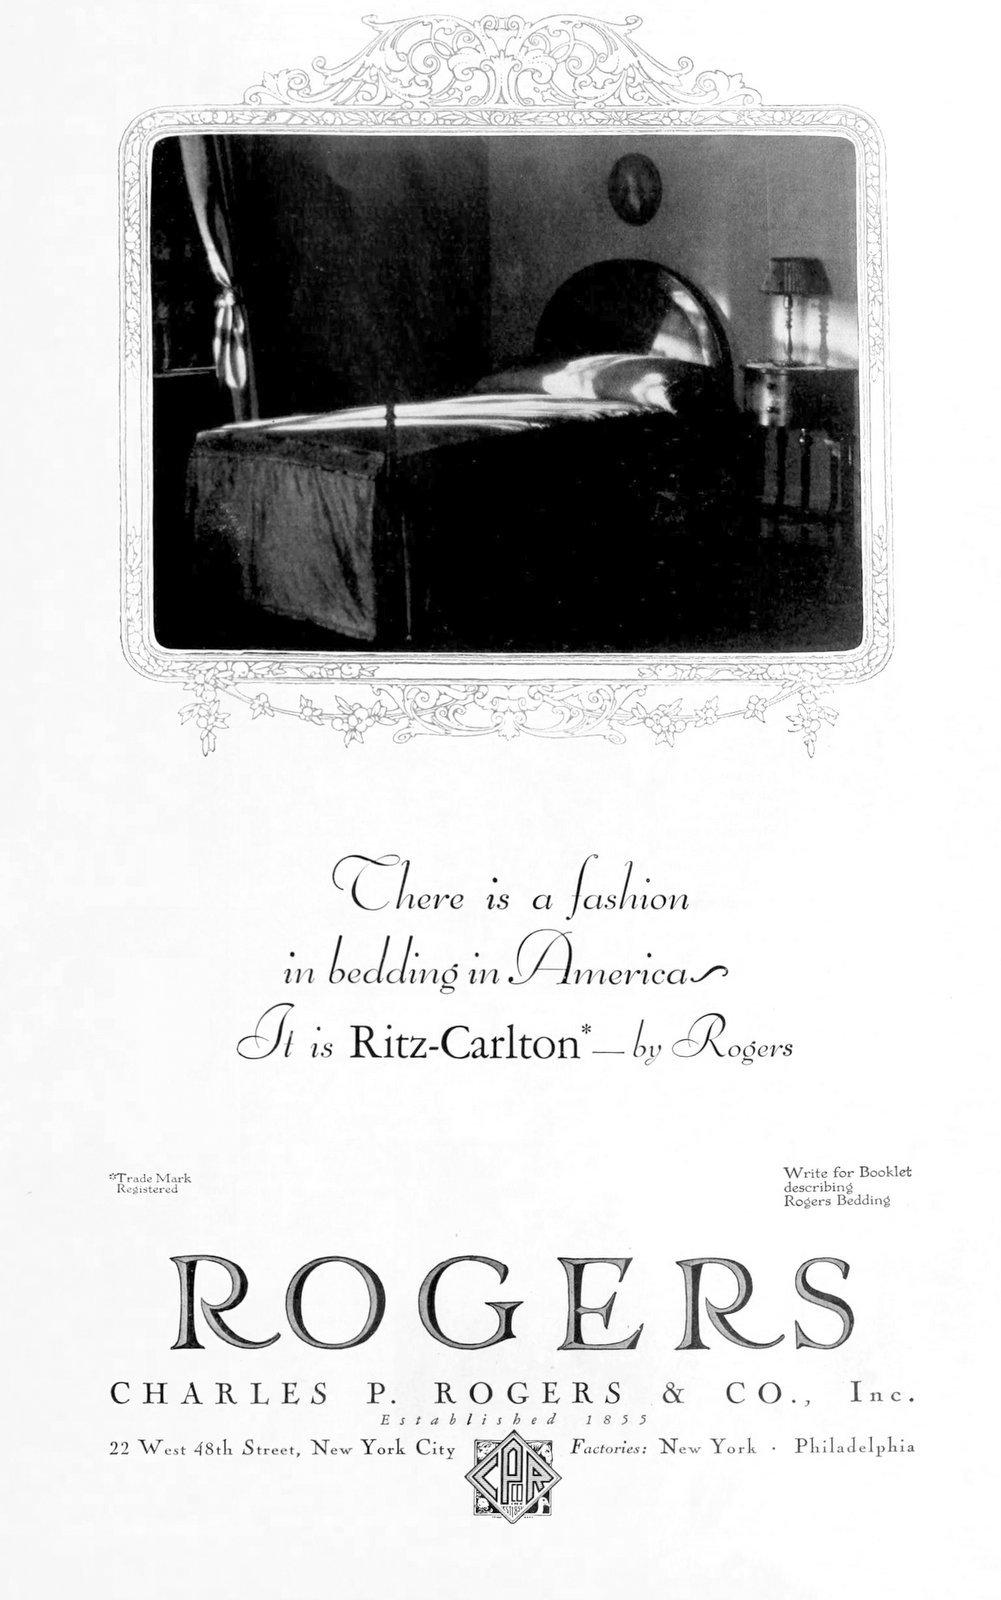 Rogers Ritz-Carlton bedding (1927)